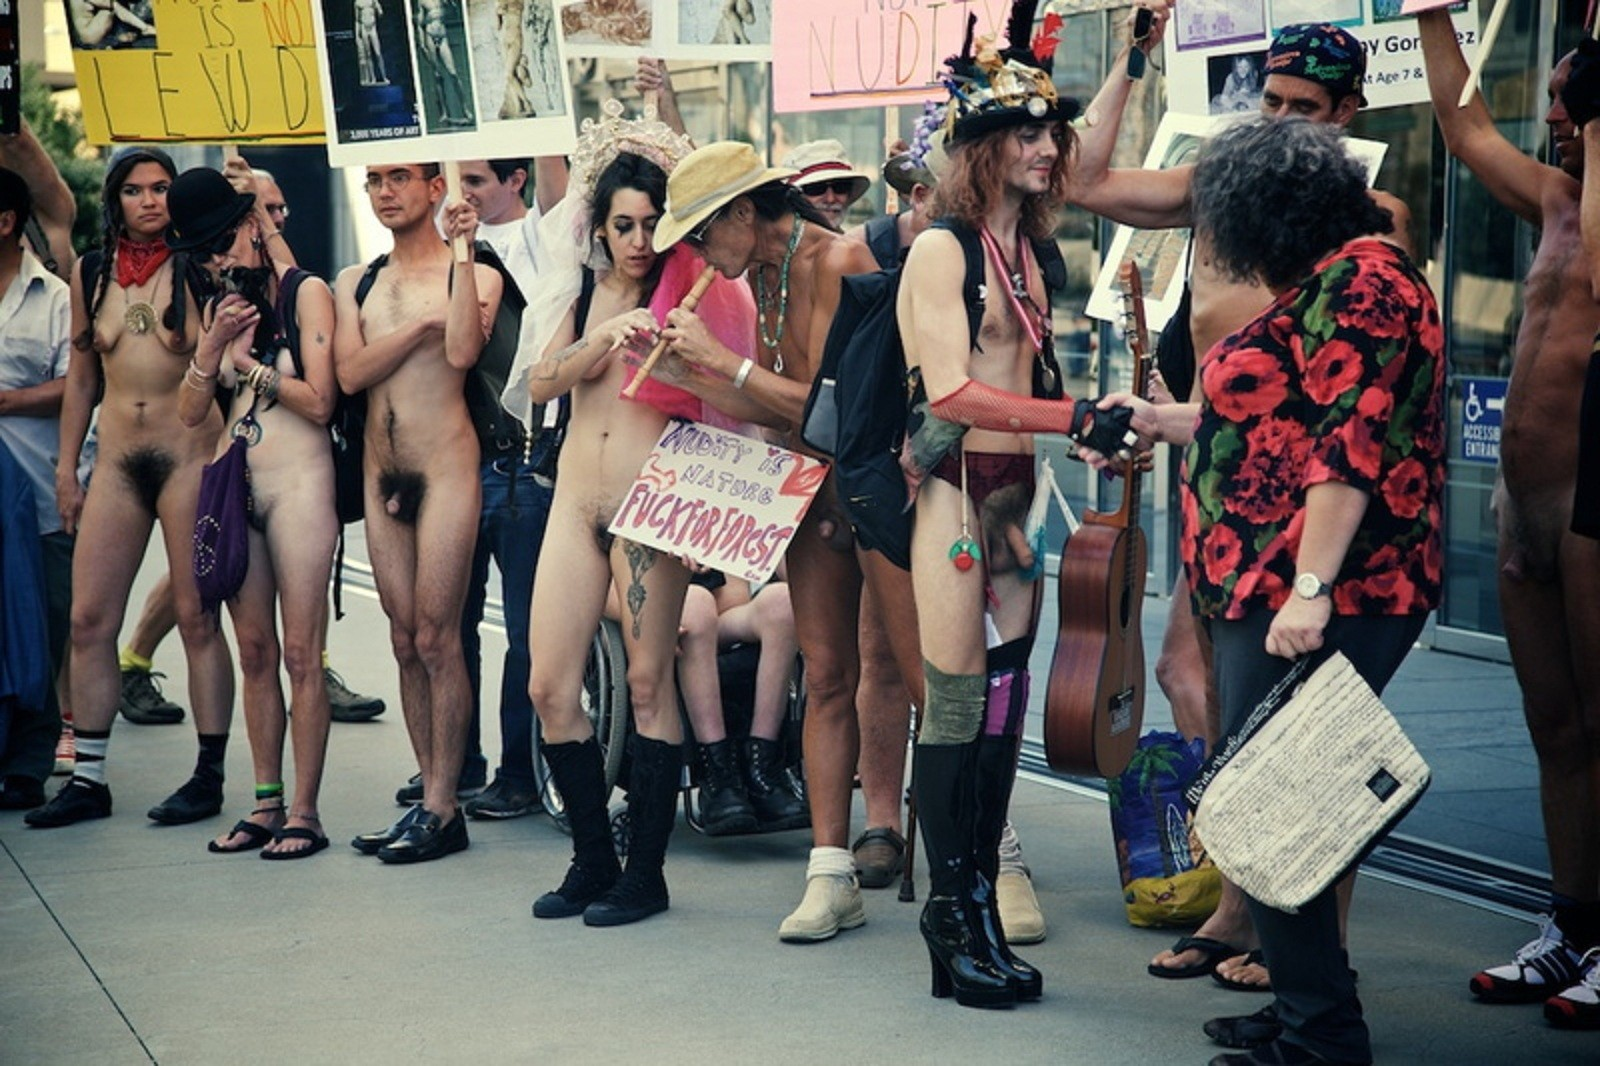 Girls naked sf, doctor penis porn movie